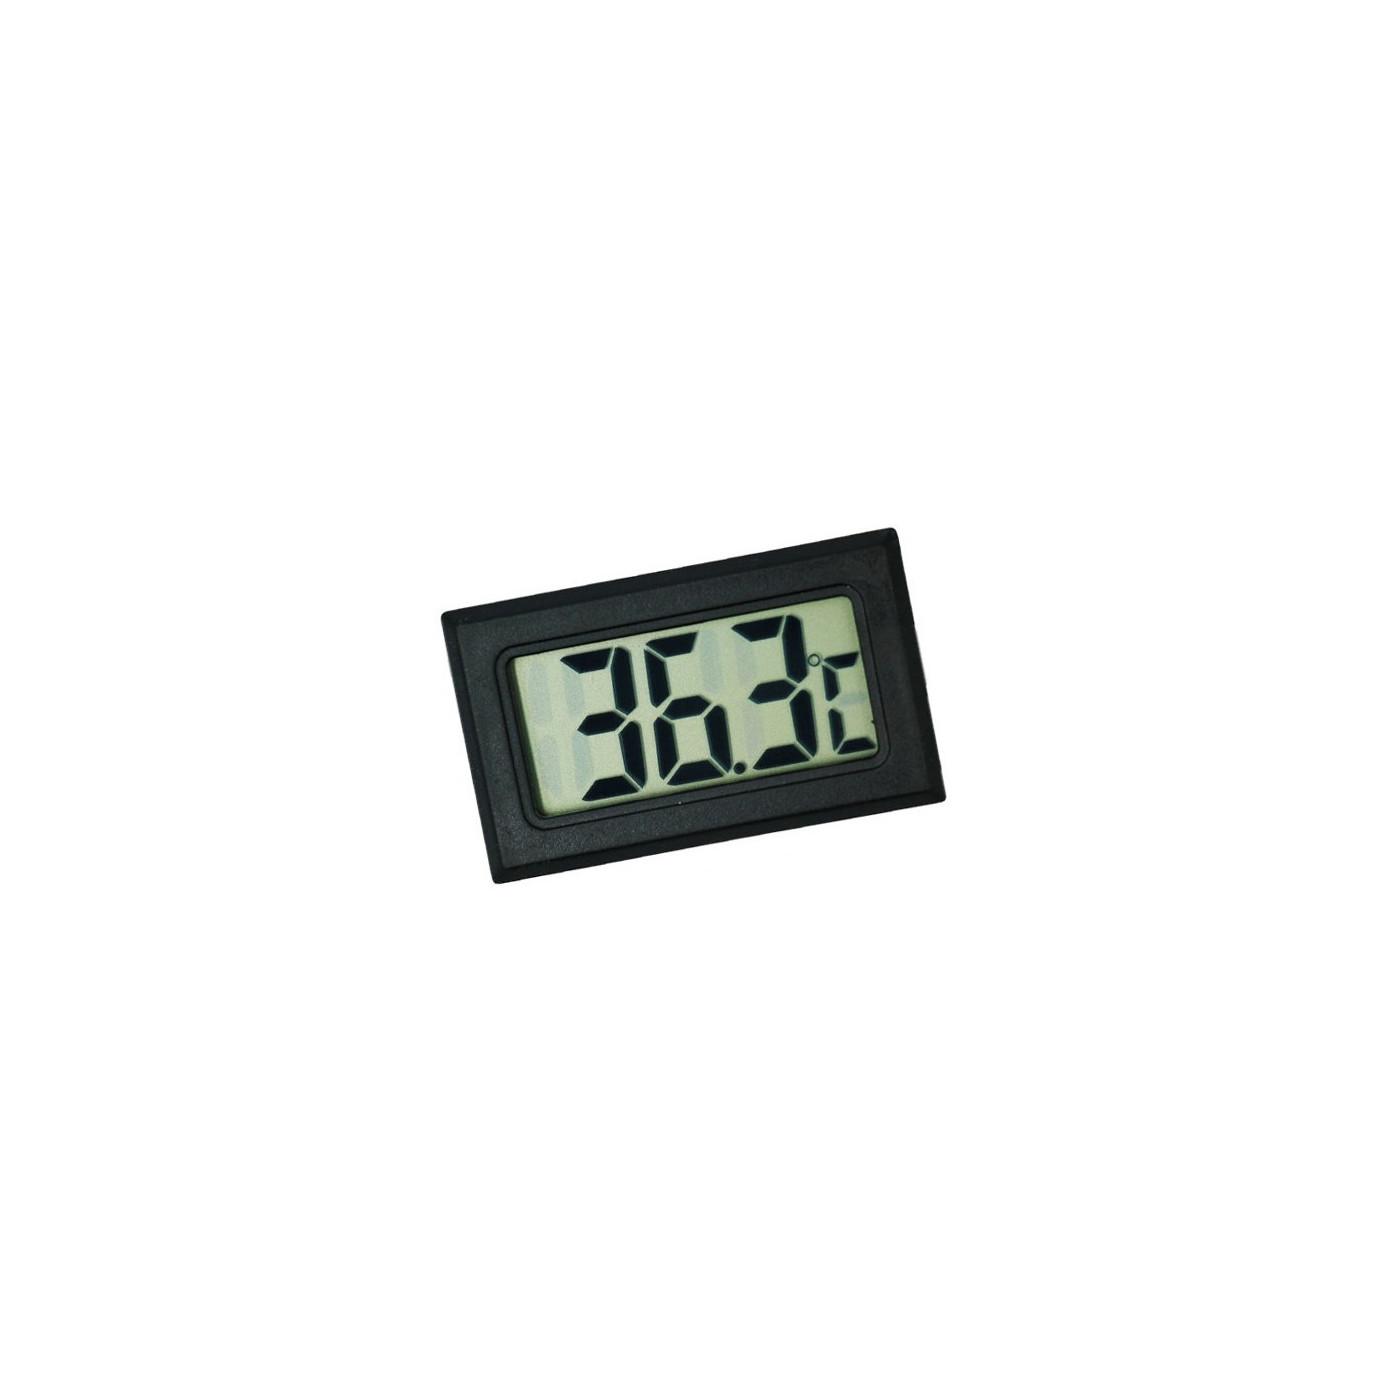 LCD indoor temperature meter (black)  - 1